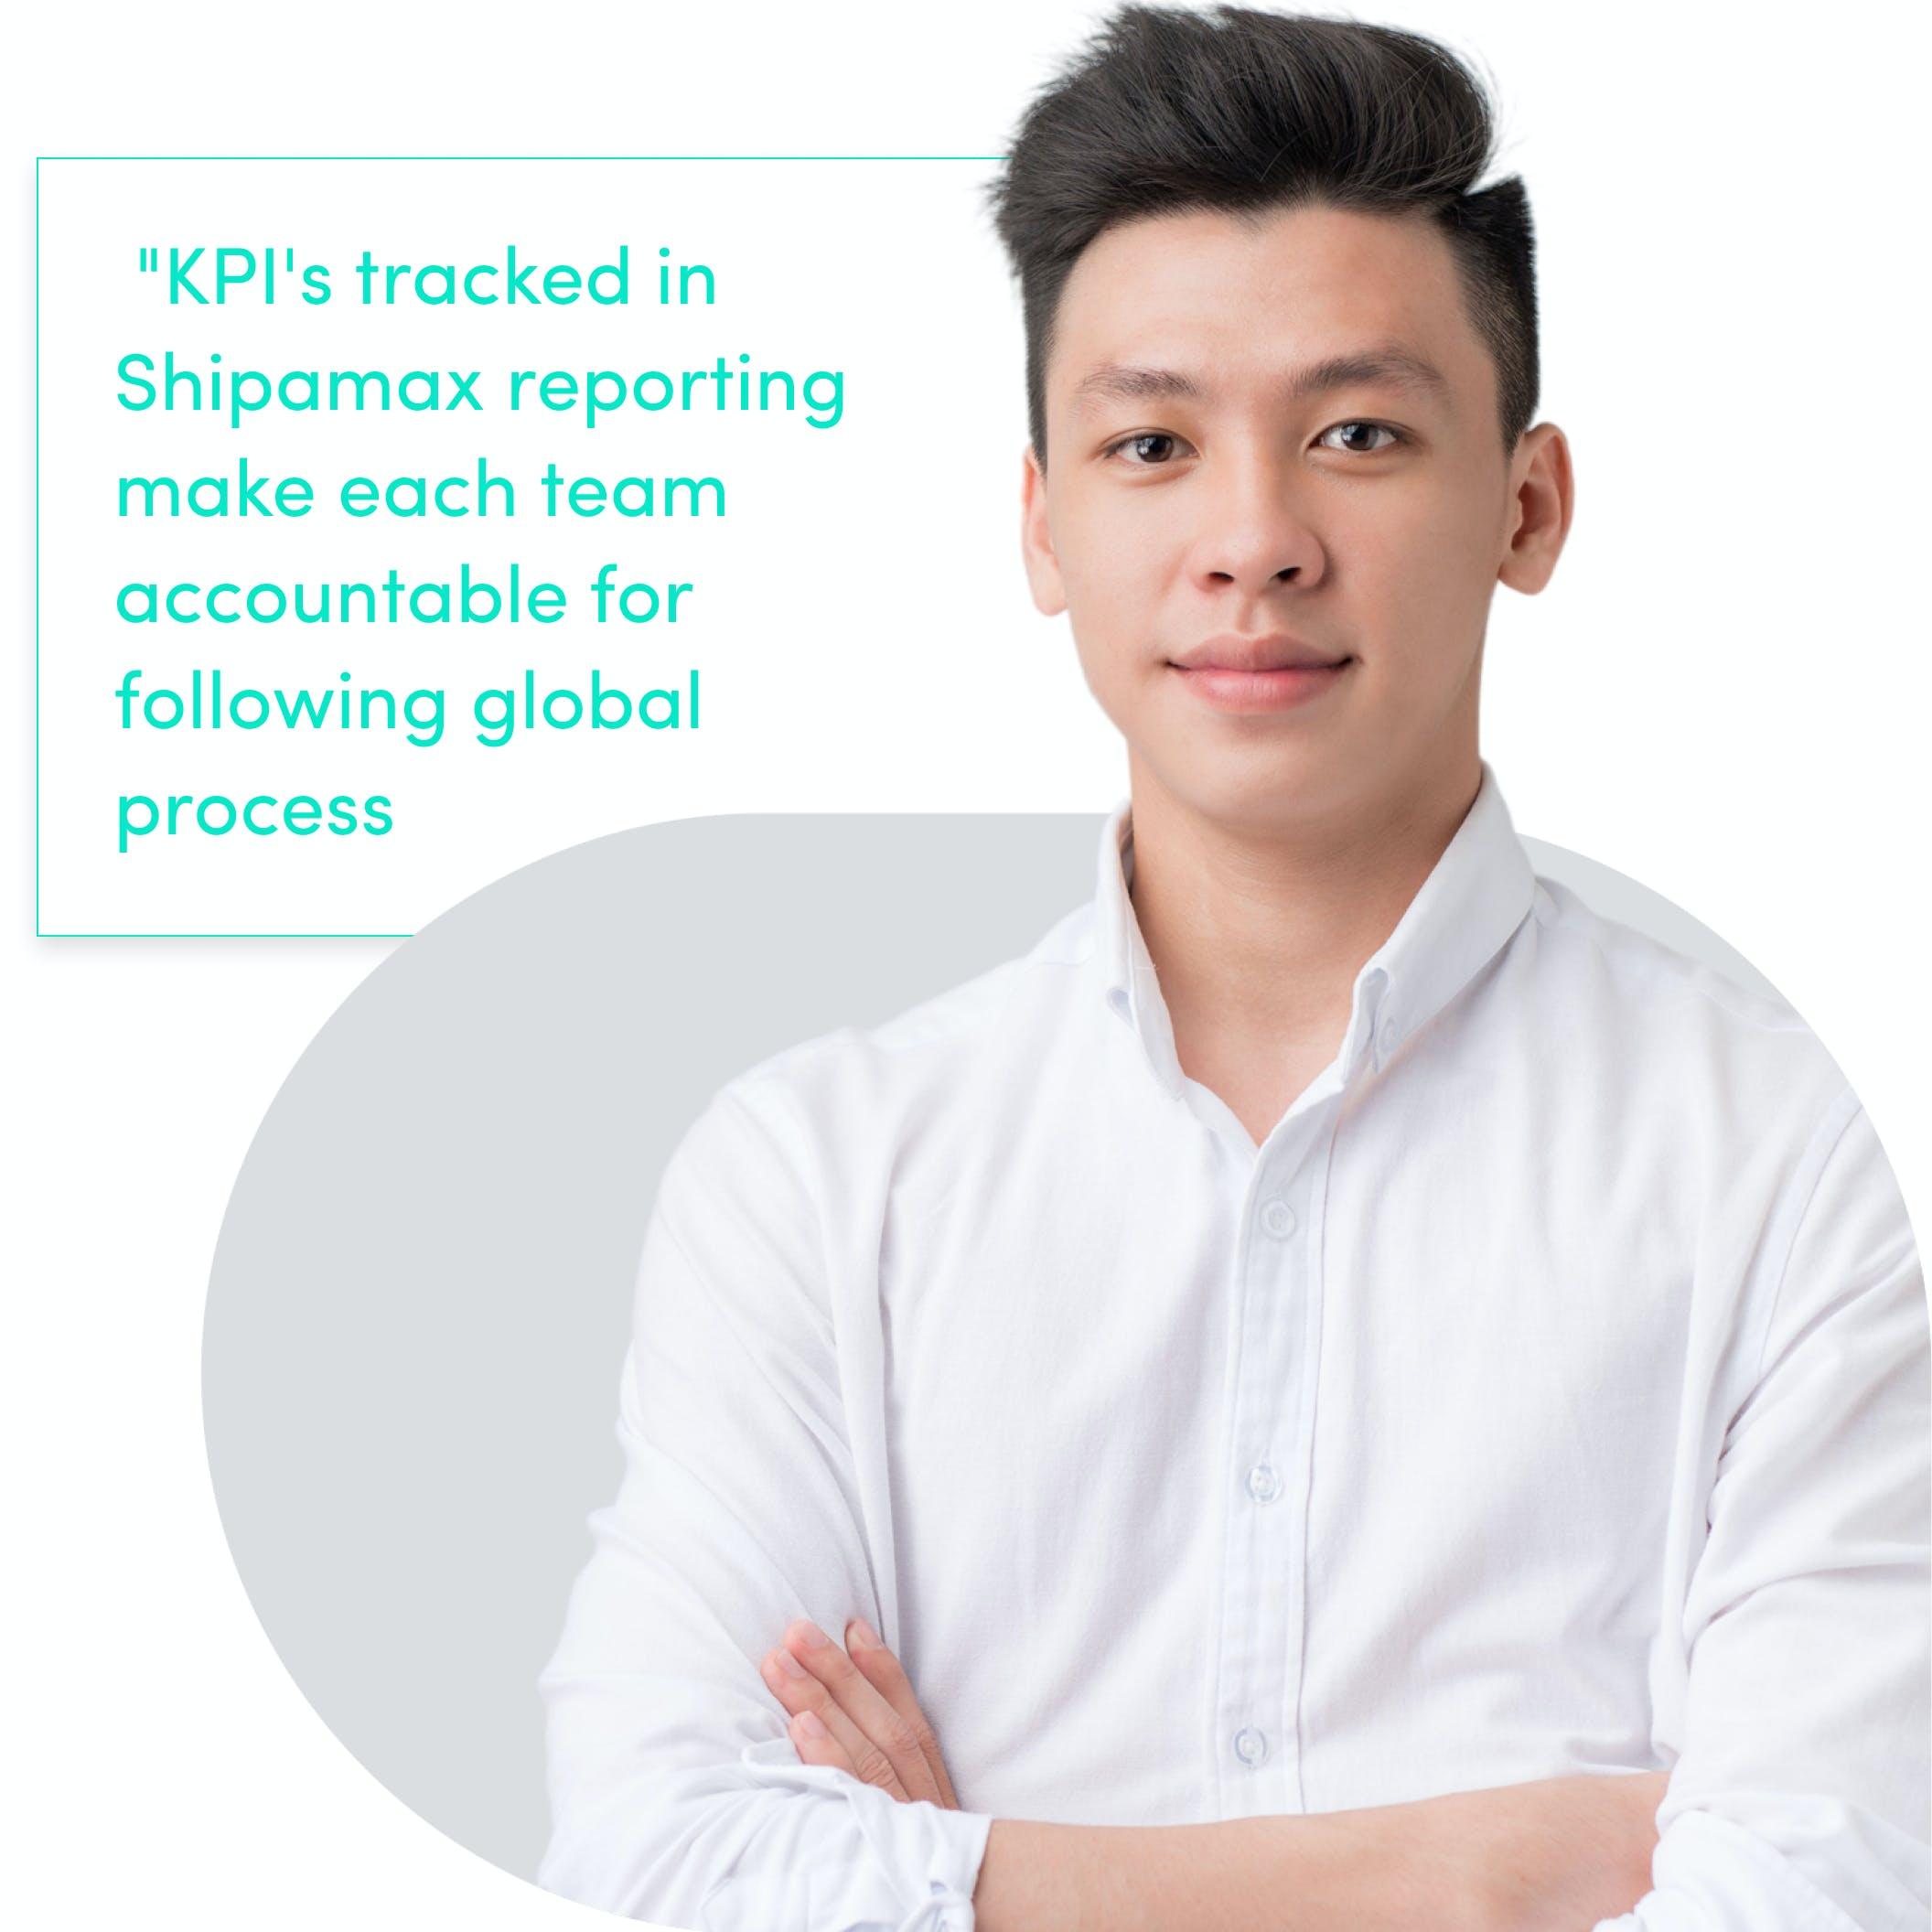 Shipamax KPIs for global process